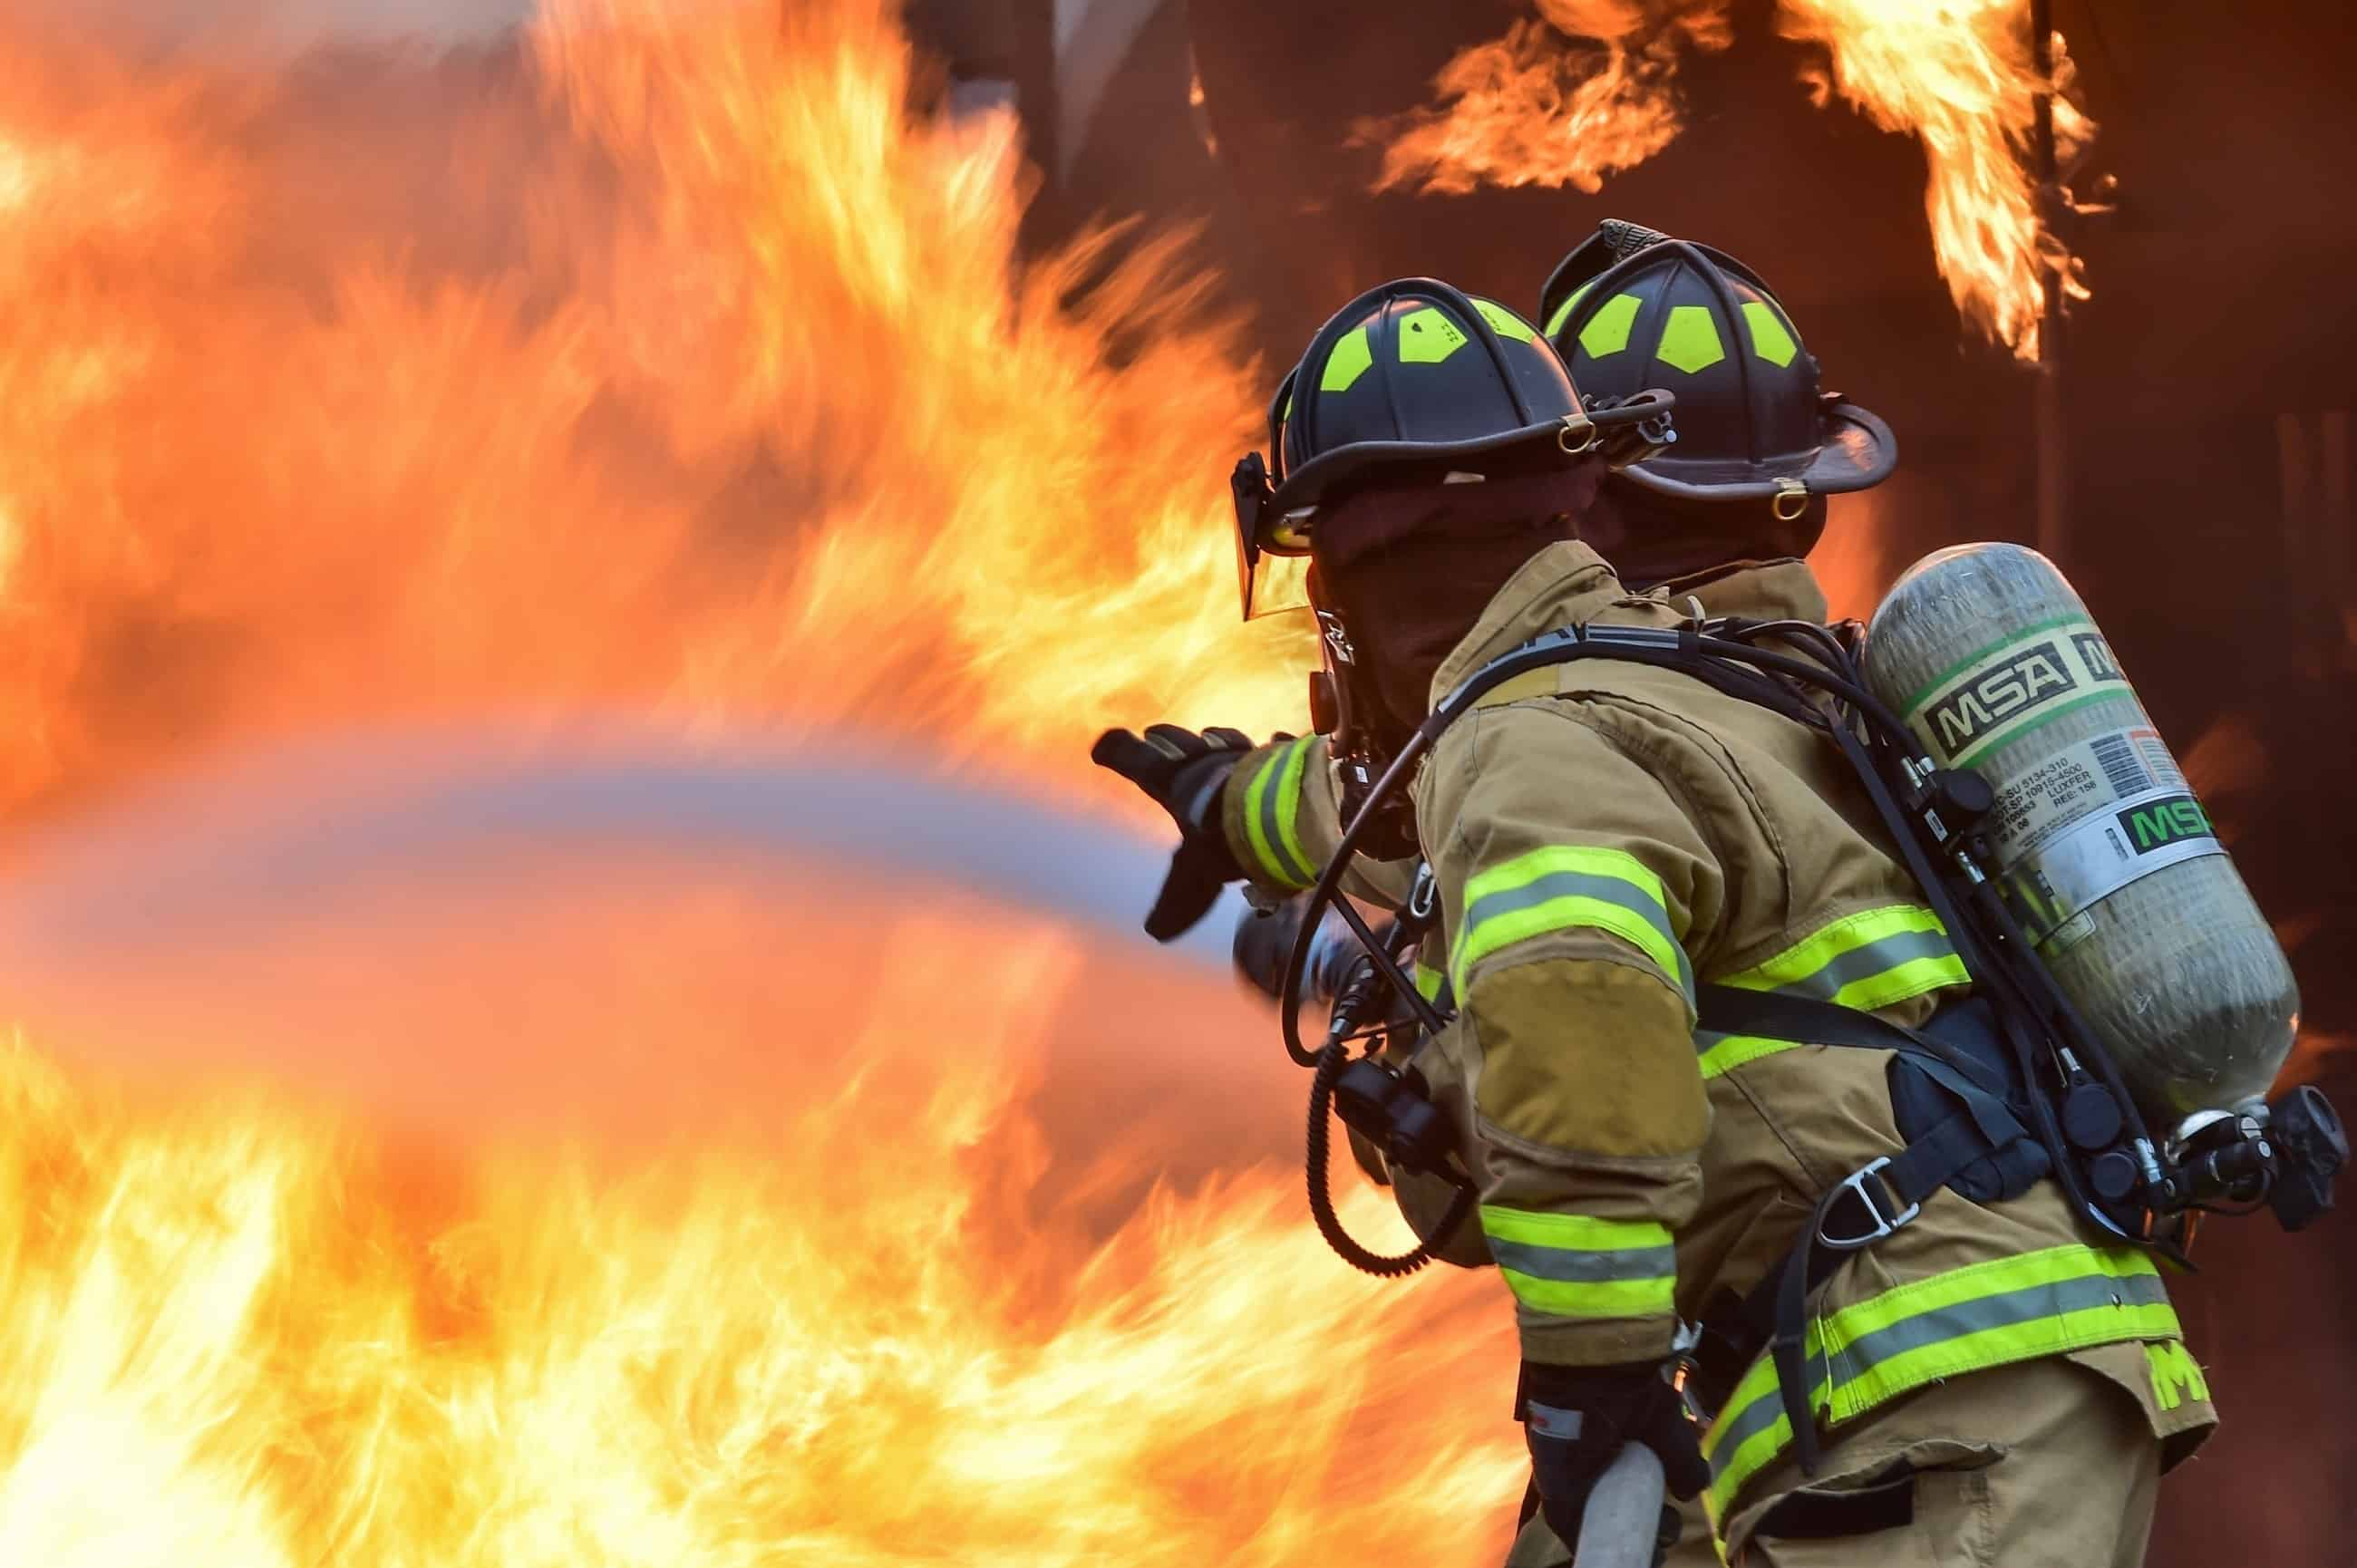 mass evacuation insurance